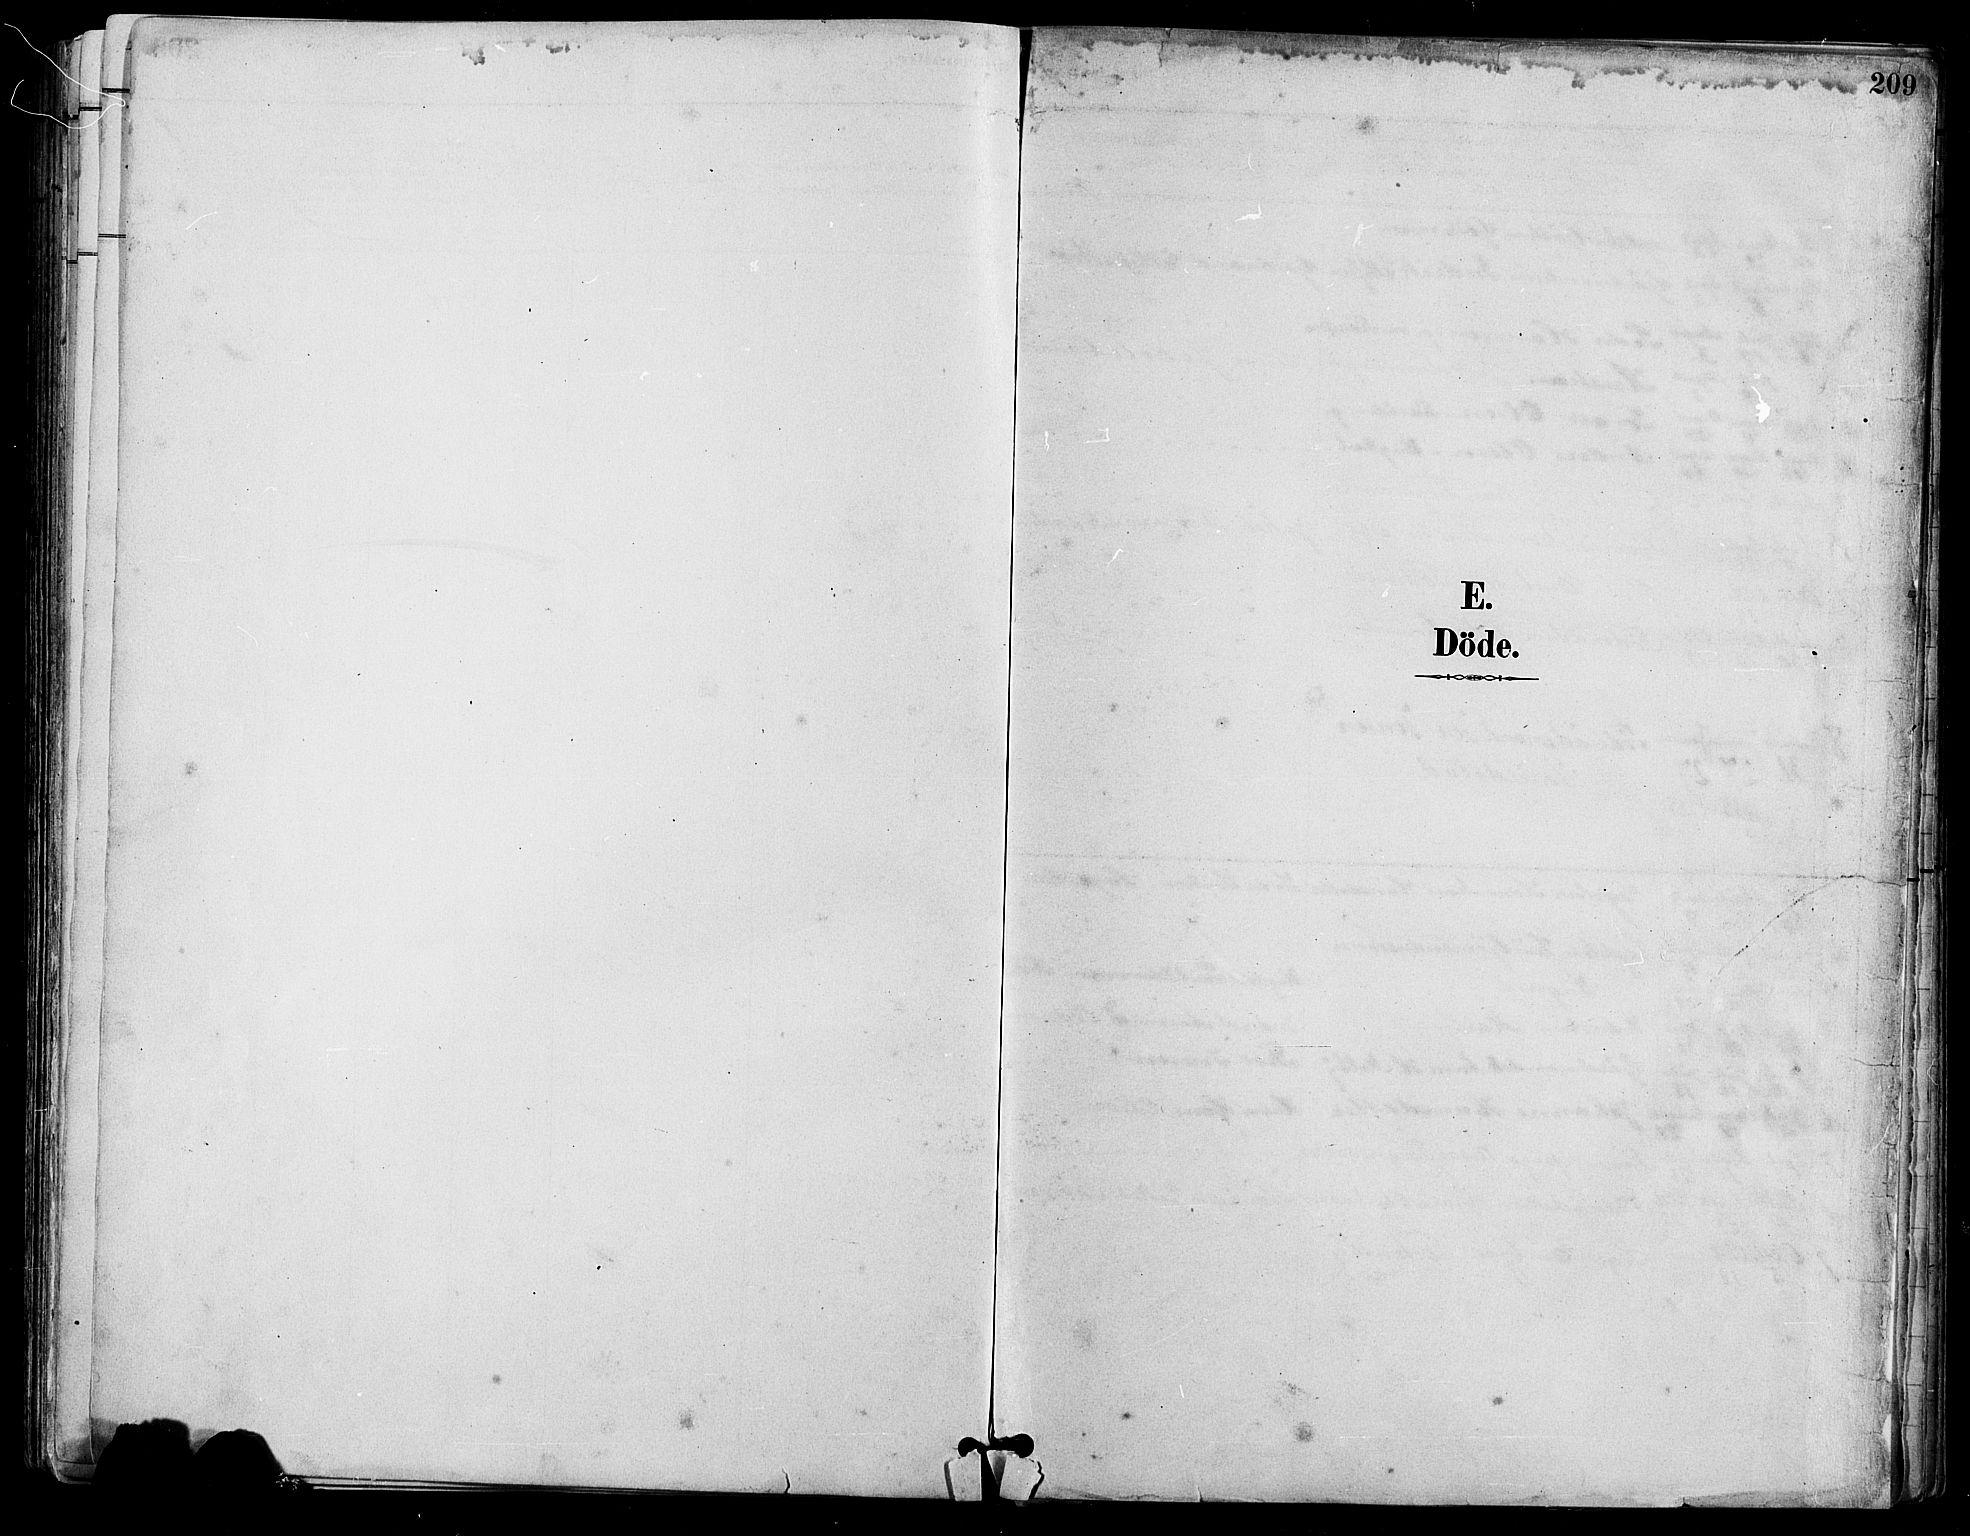 SAH, Nord-Fron prestekontor, Klokkerbok nr. 5, 1884-1914, s. 209